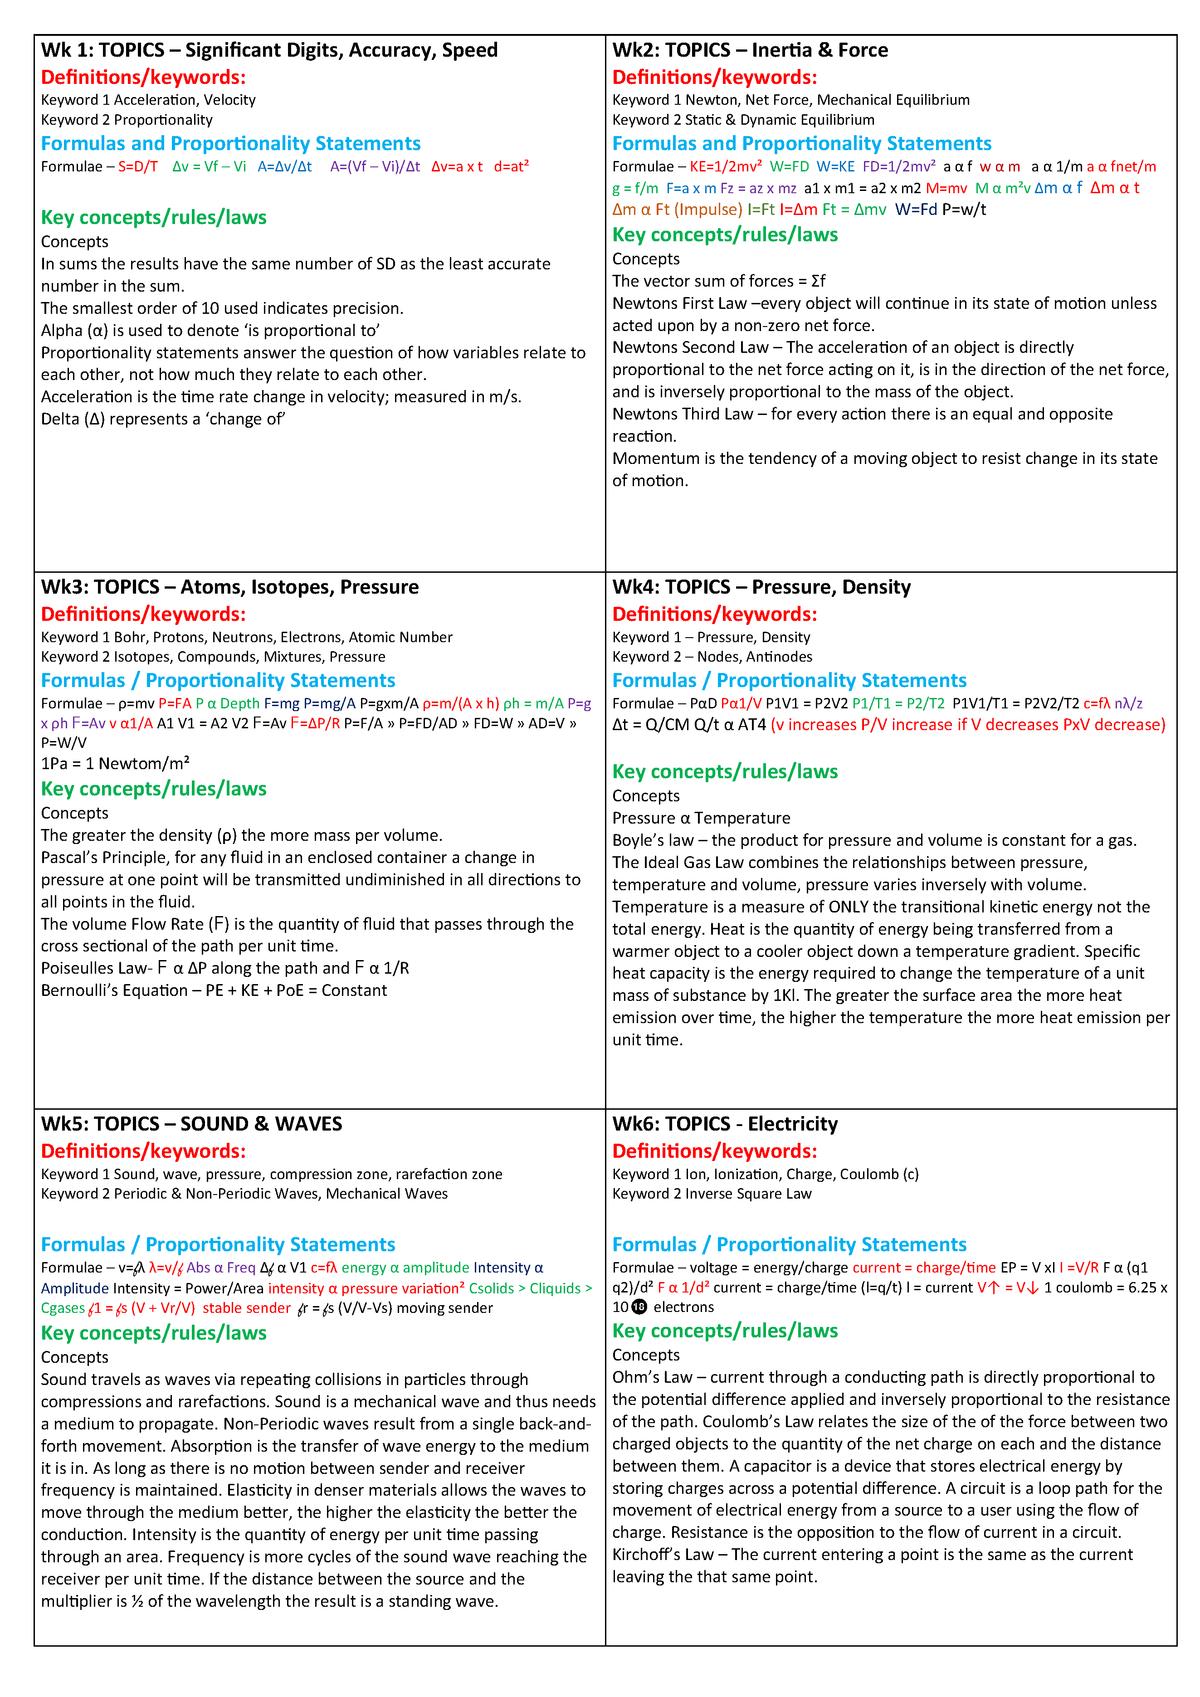 MEDI11002 Exam cheat sheet - Physics for Health Sciences